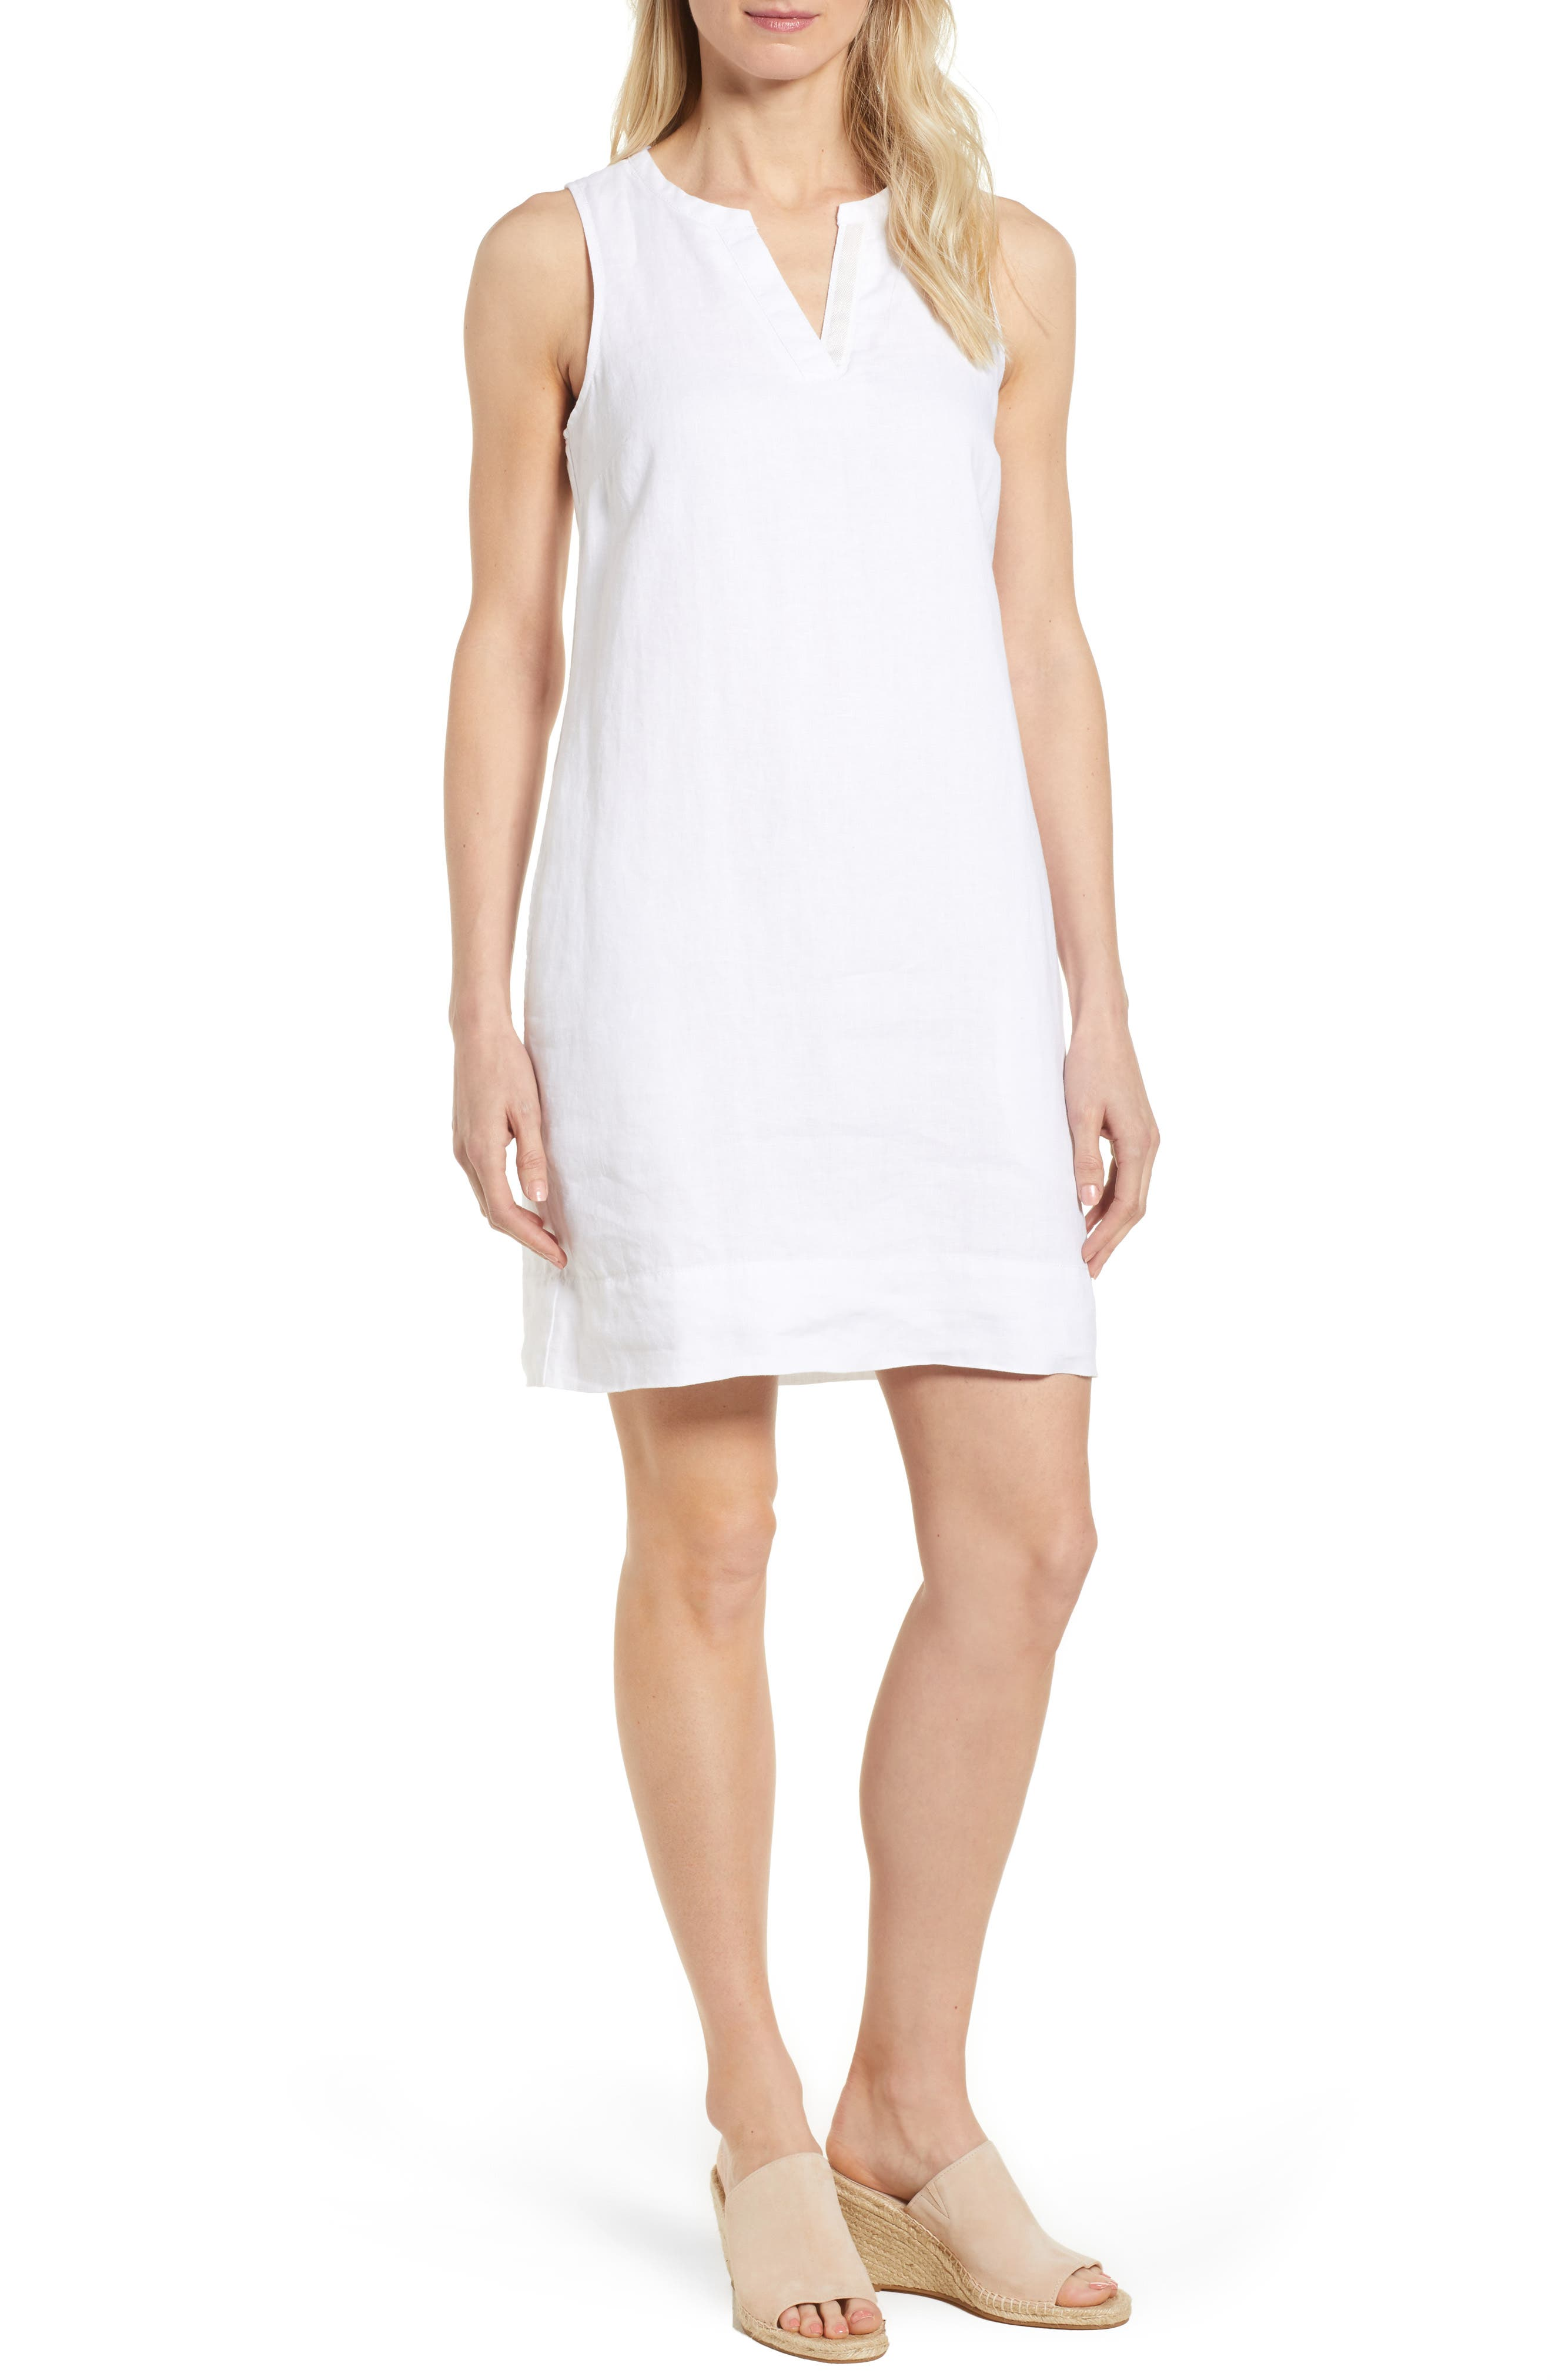 TOMMY BAHAMA Sea Glass Linen Shift Dress, Main, color, WHITE